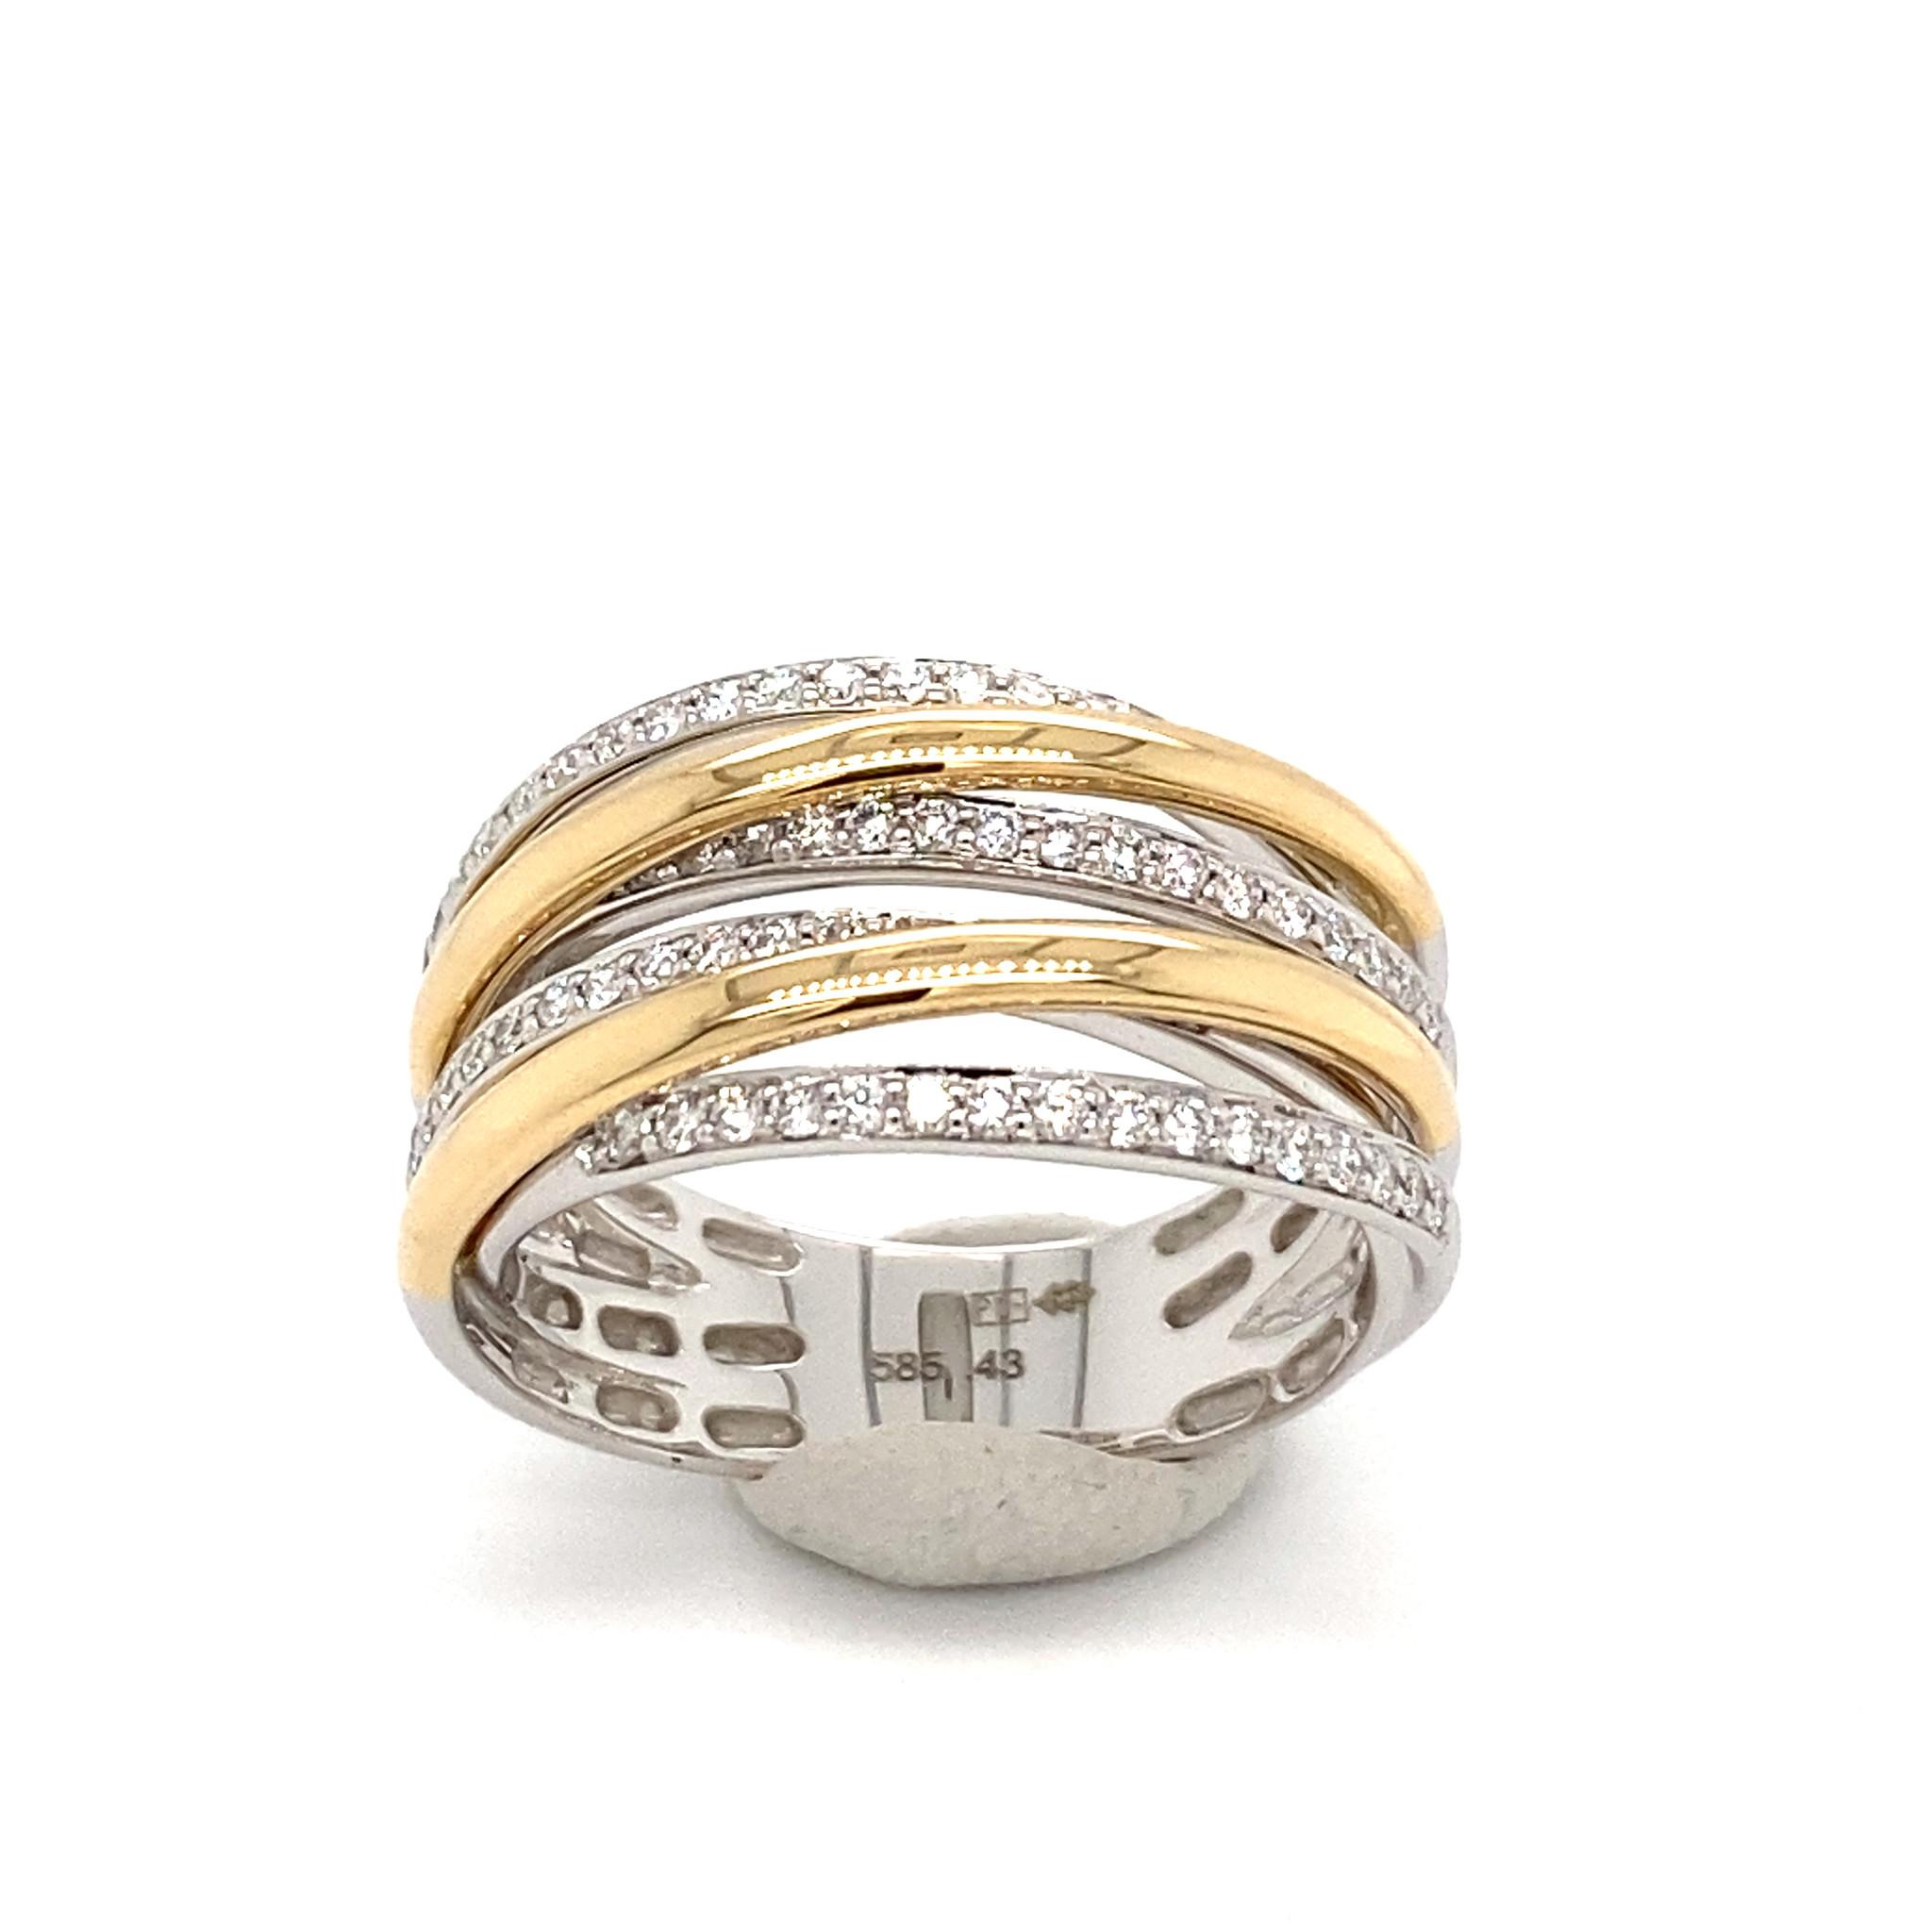 Private Label CvdK Private Label CvdK 14 krt. geel/witgouden ring met diamanten